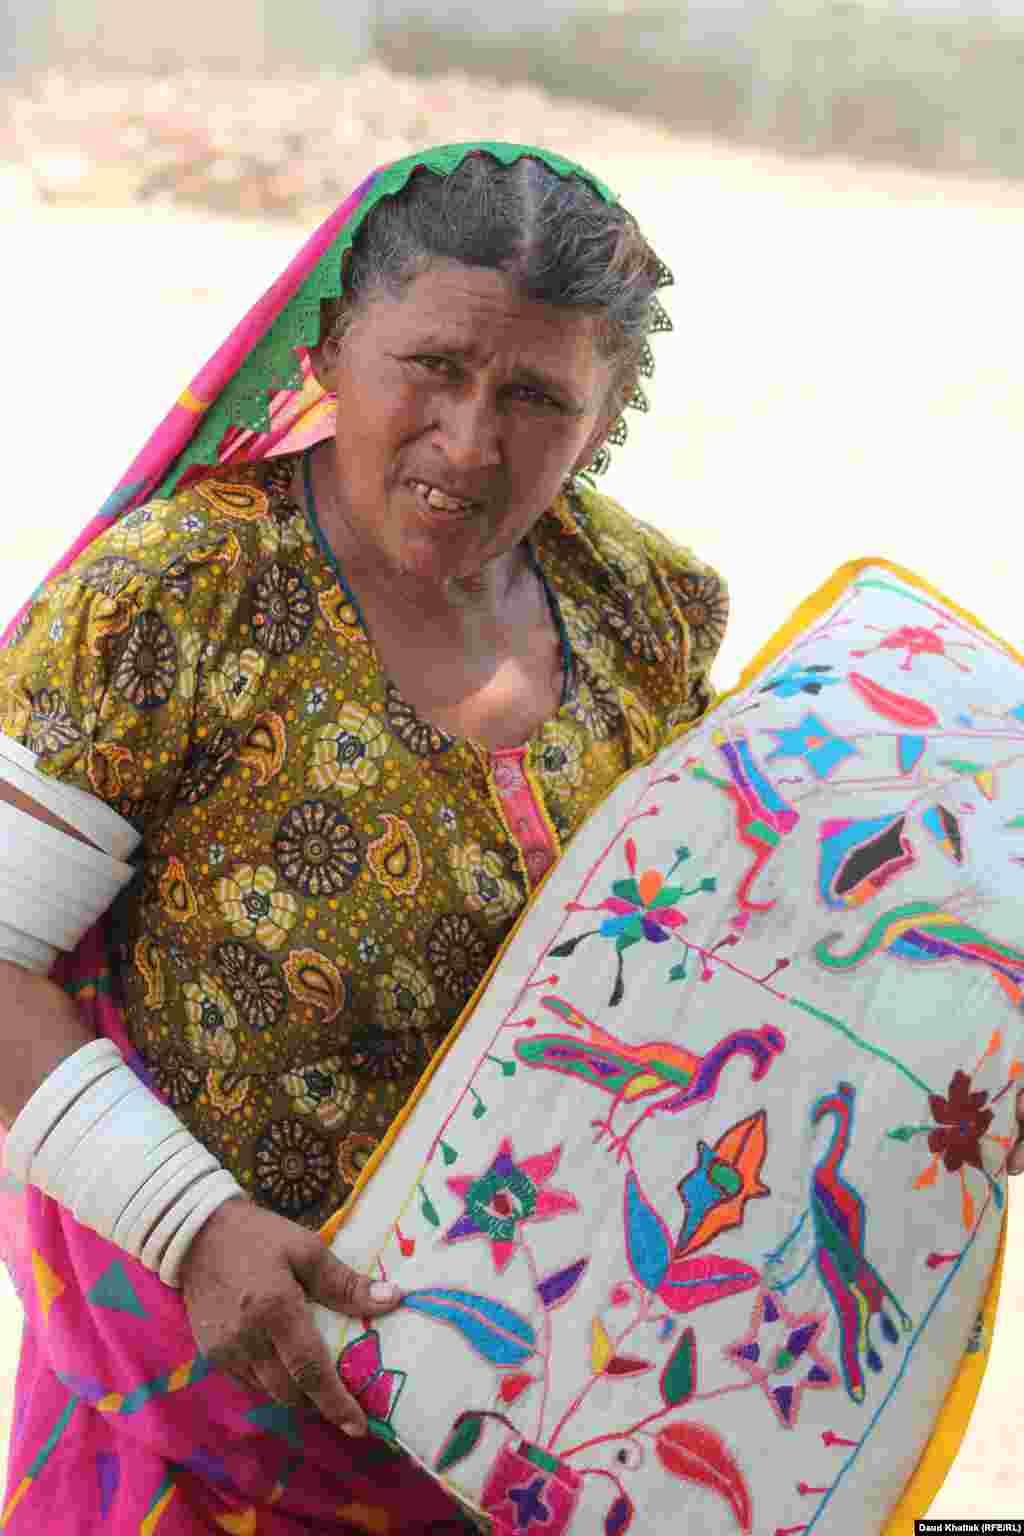 Kallan Bibi holds a handmade pillow case featuring Tharparkar's traditional embroidery.